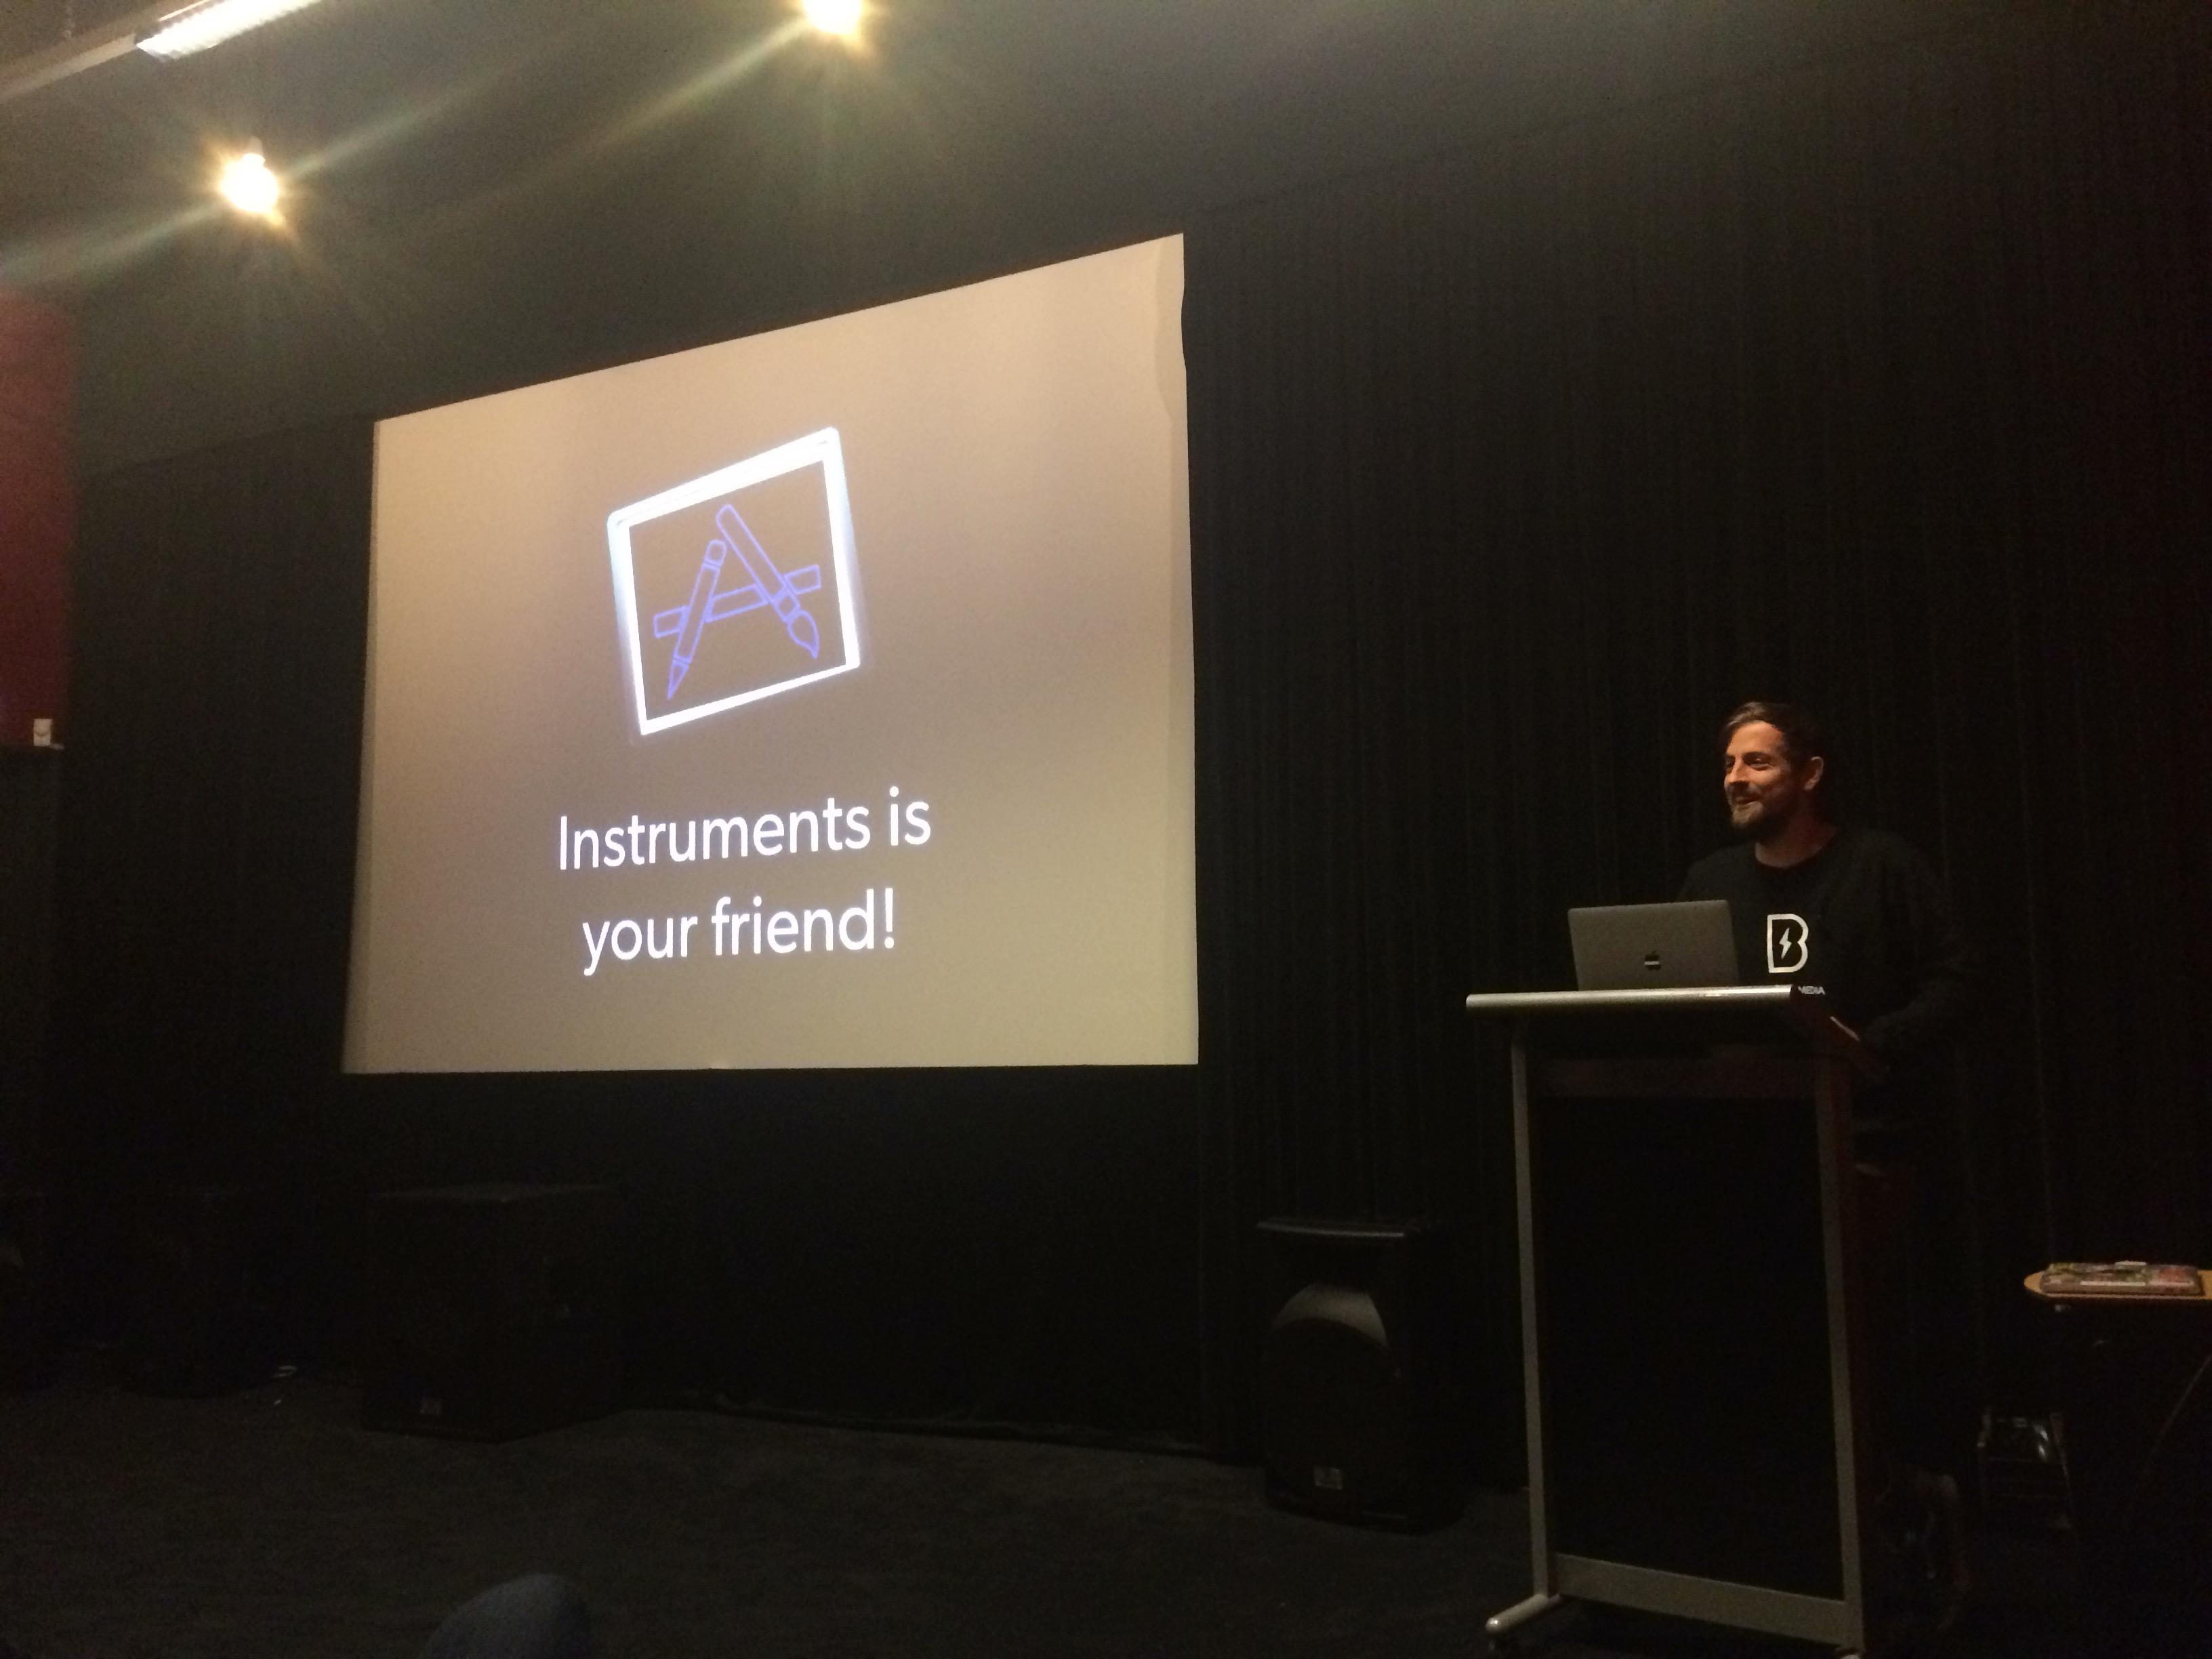 Erwin presenting